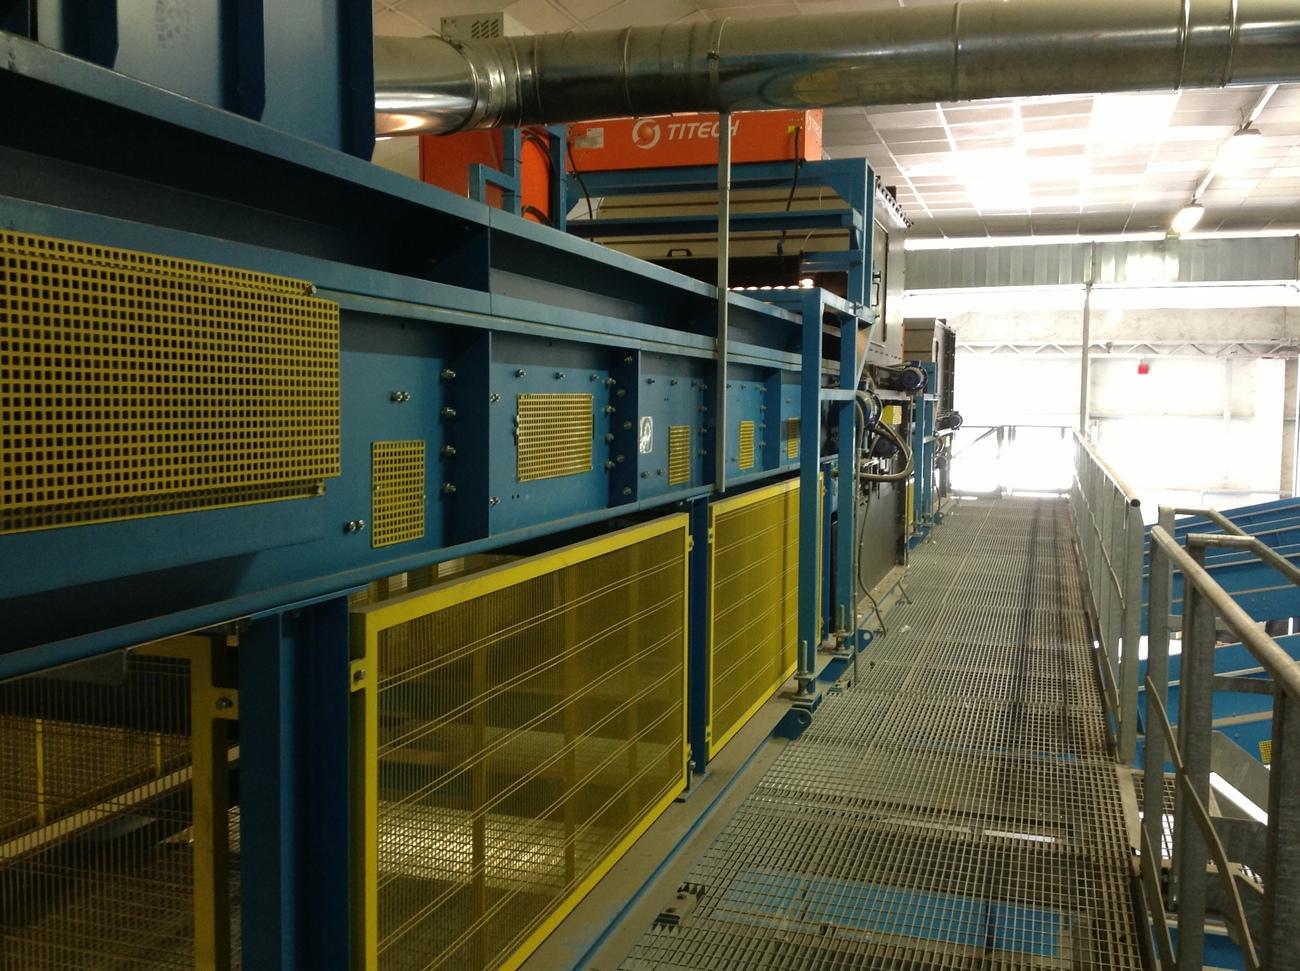 Waste rubber conveyor belts waste conveyors - Rd wastebasket ...